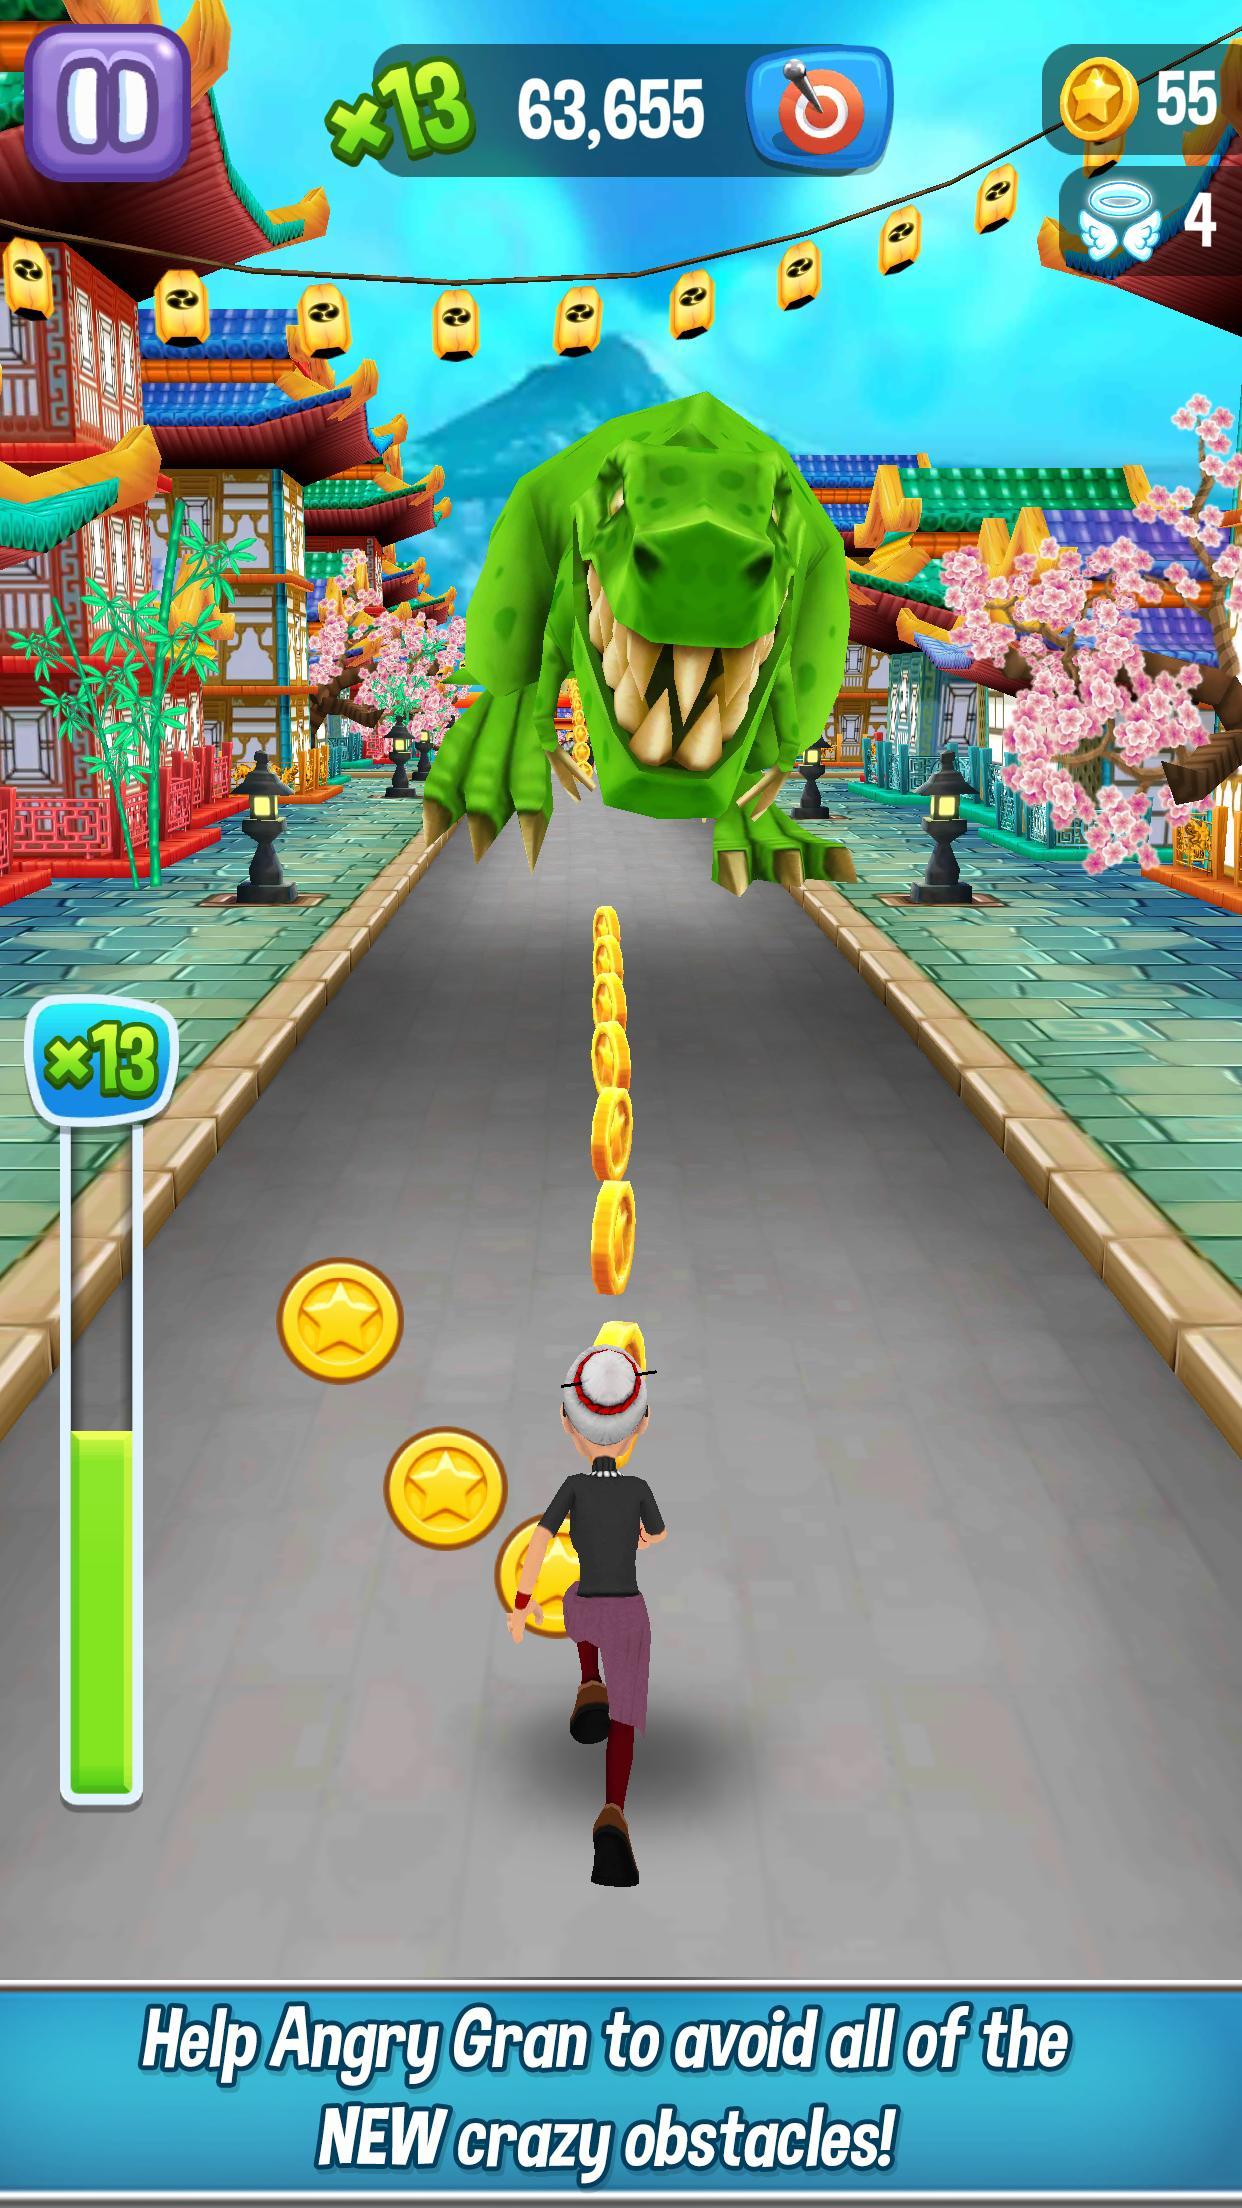 Angry Gran Run Running Game 2.12.1 Screenshot 5